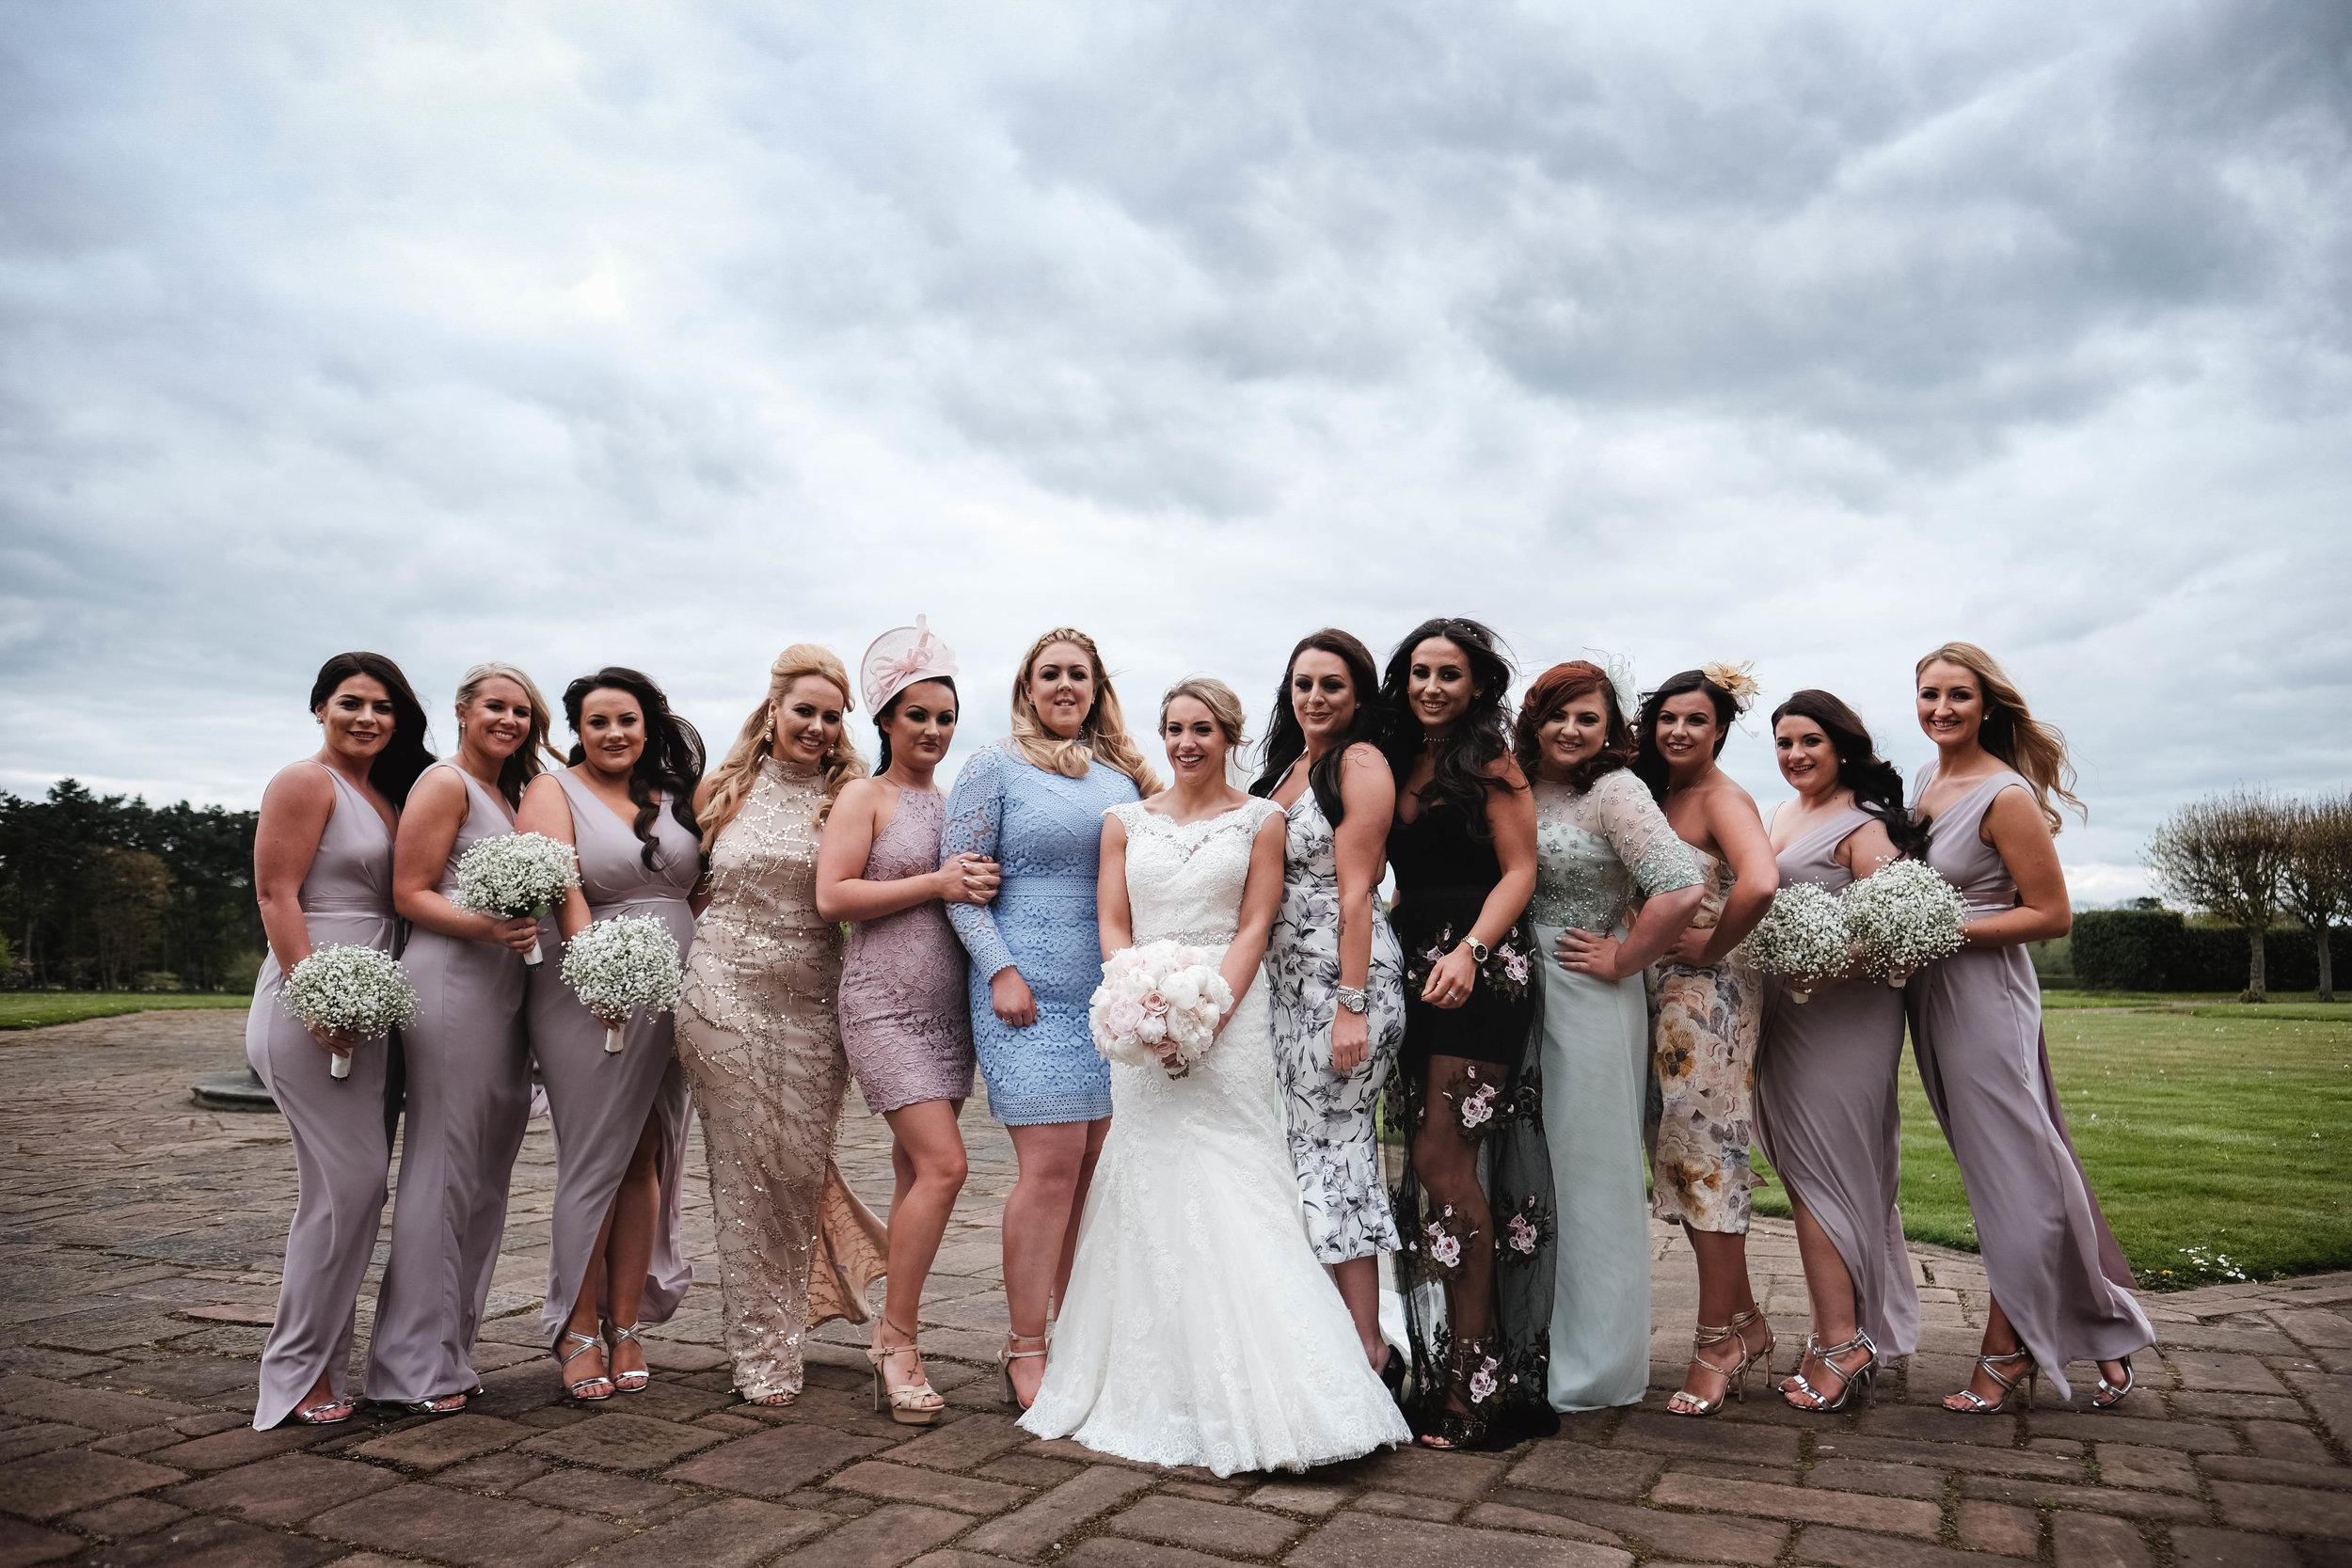 Thornton manor wedding photography cheshire wedding photographer liverpool manchester warrington chester wirral wedding BLOG (59 of 108).jpg